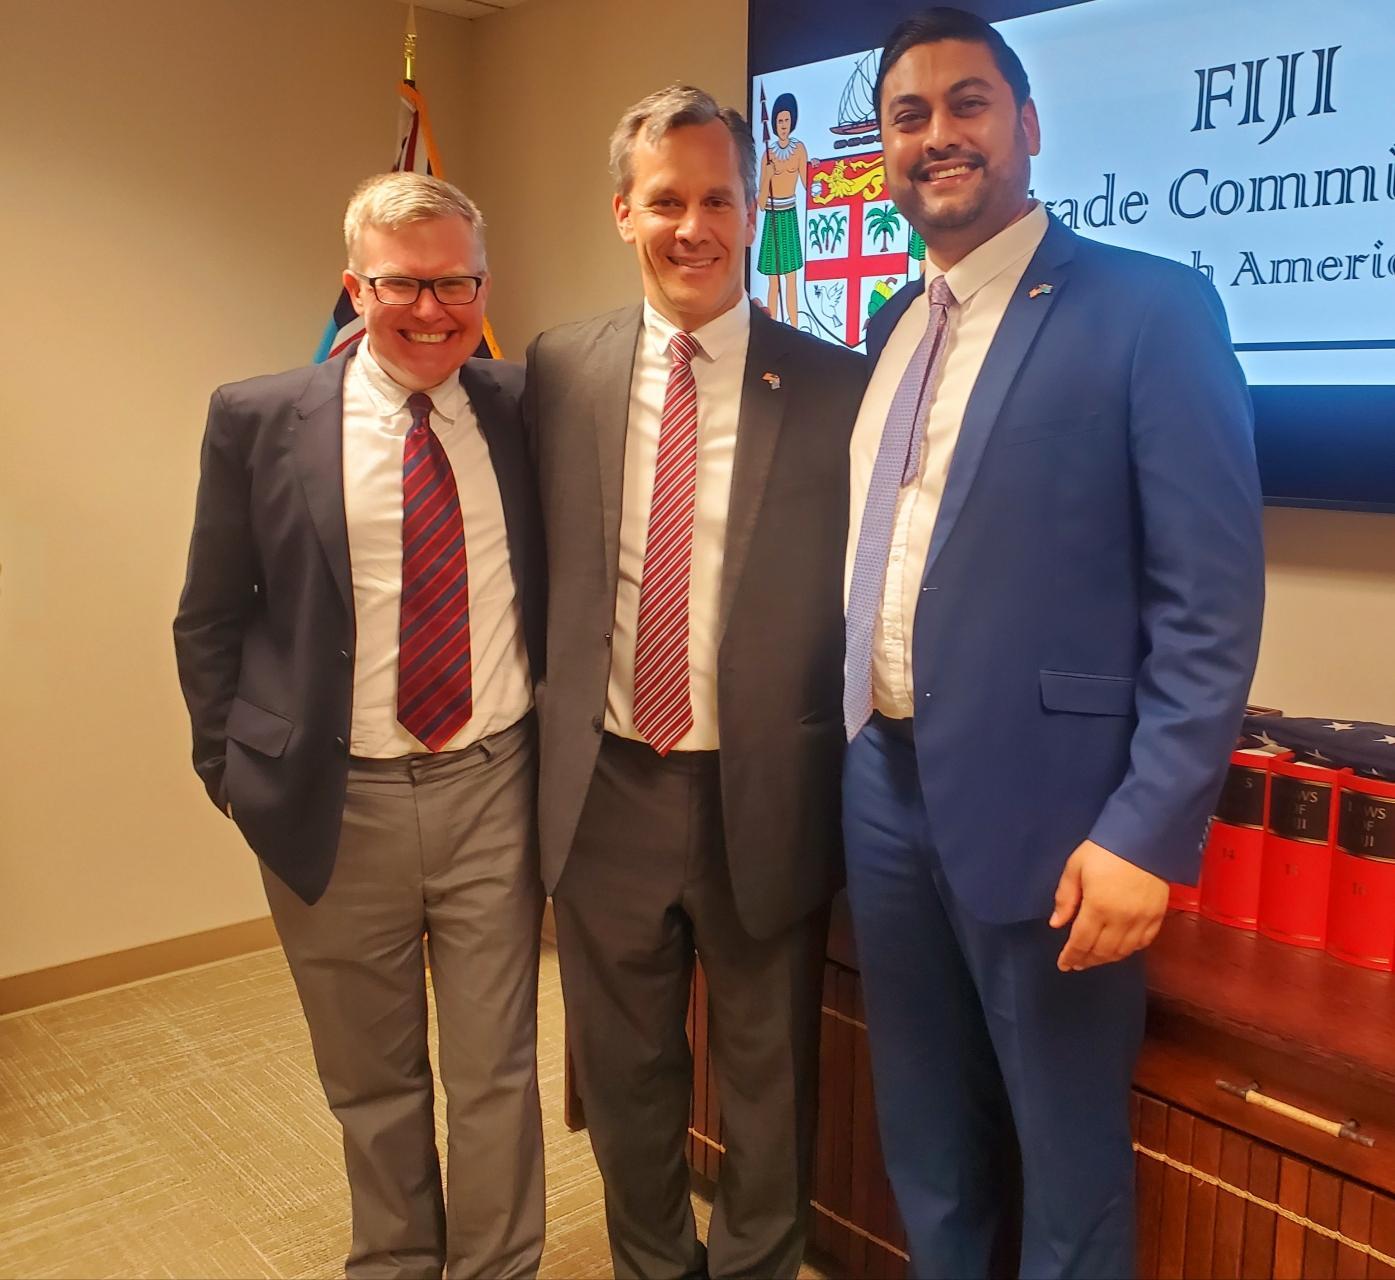 Last Friday the Fiji Trade Commission North America was Honored to host USA Ambassador to Fiji Mr Joseph Cella.